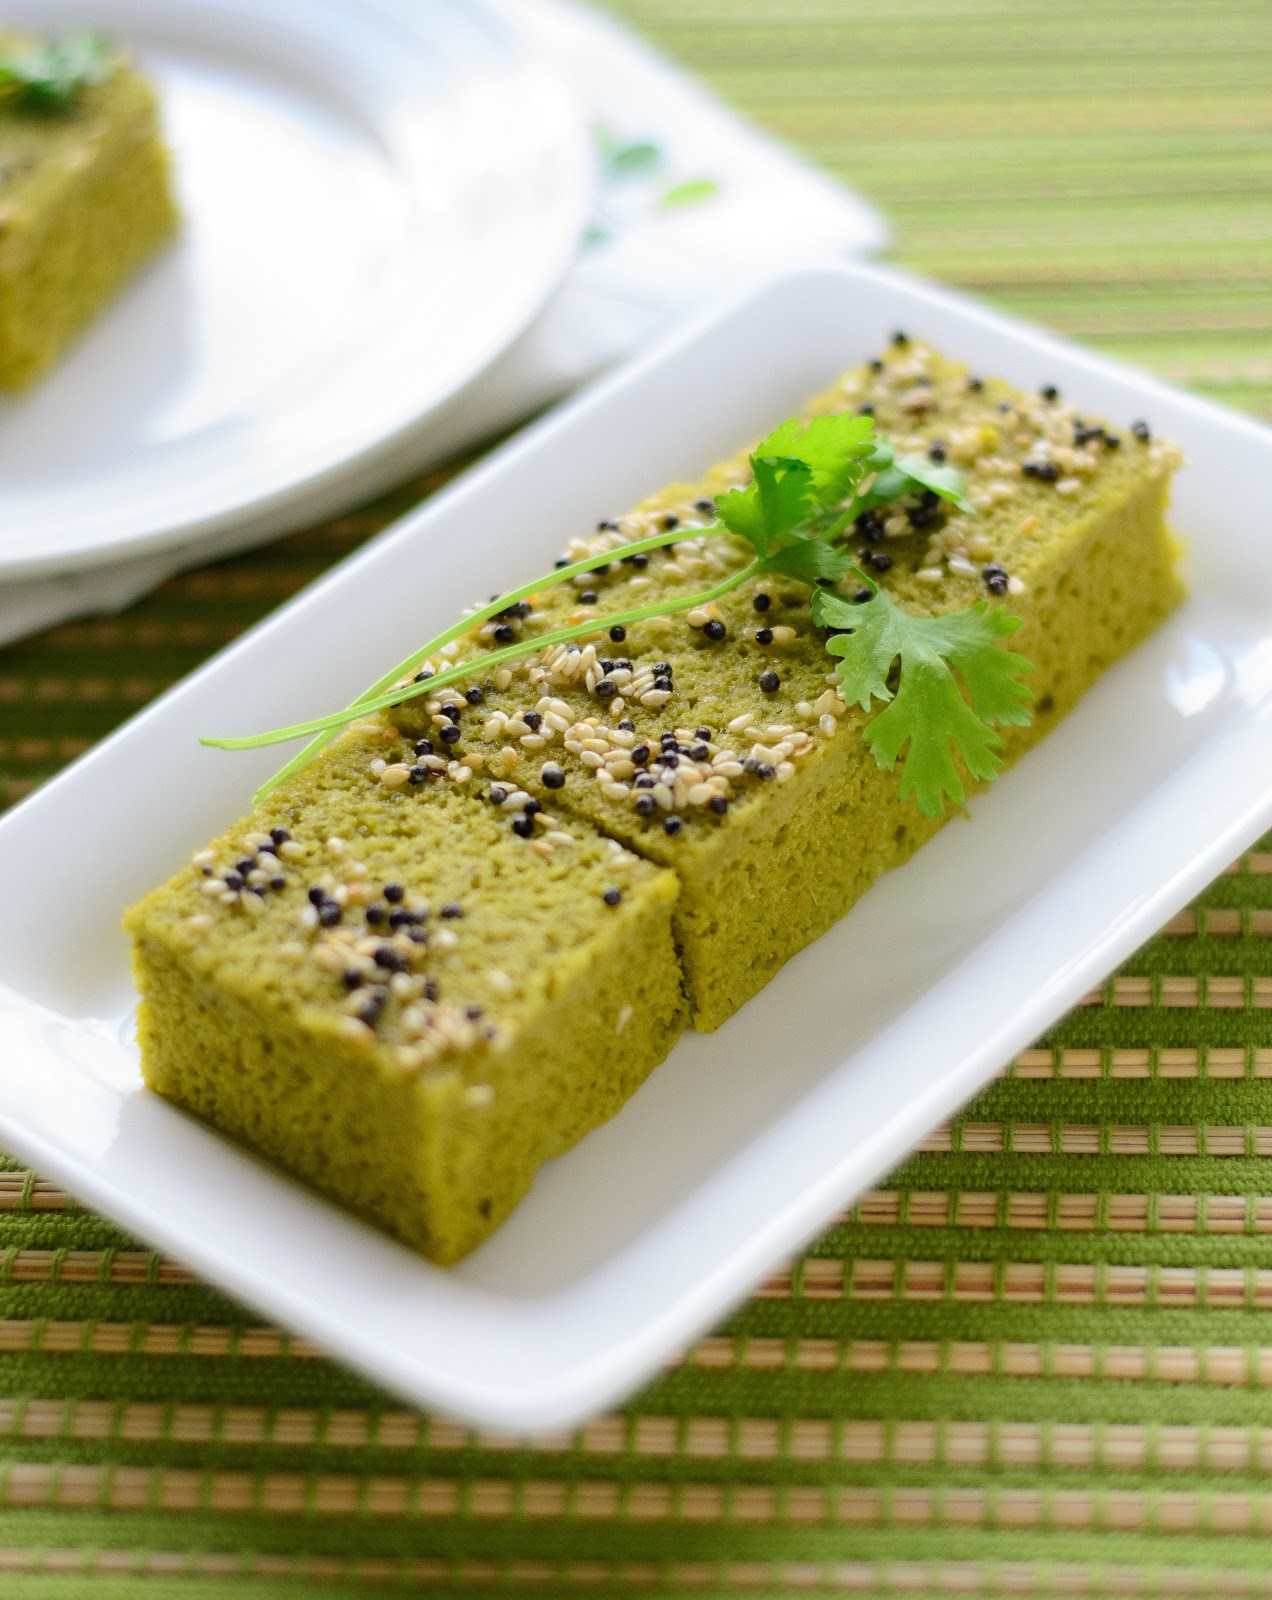 Greens Lemon Cake